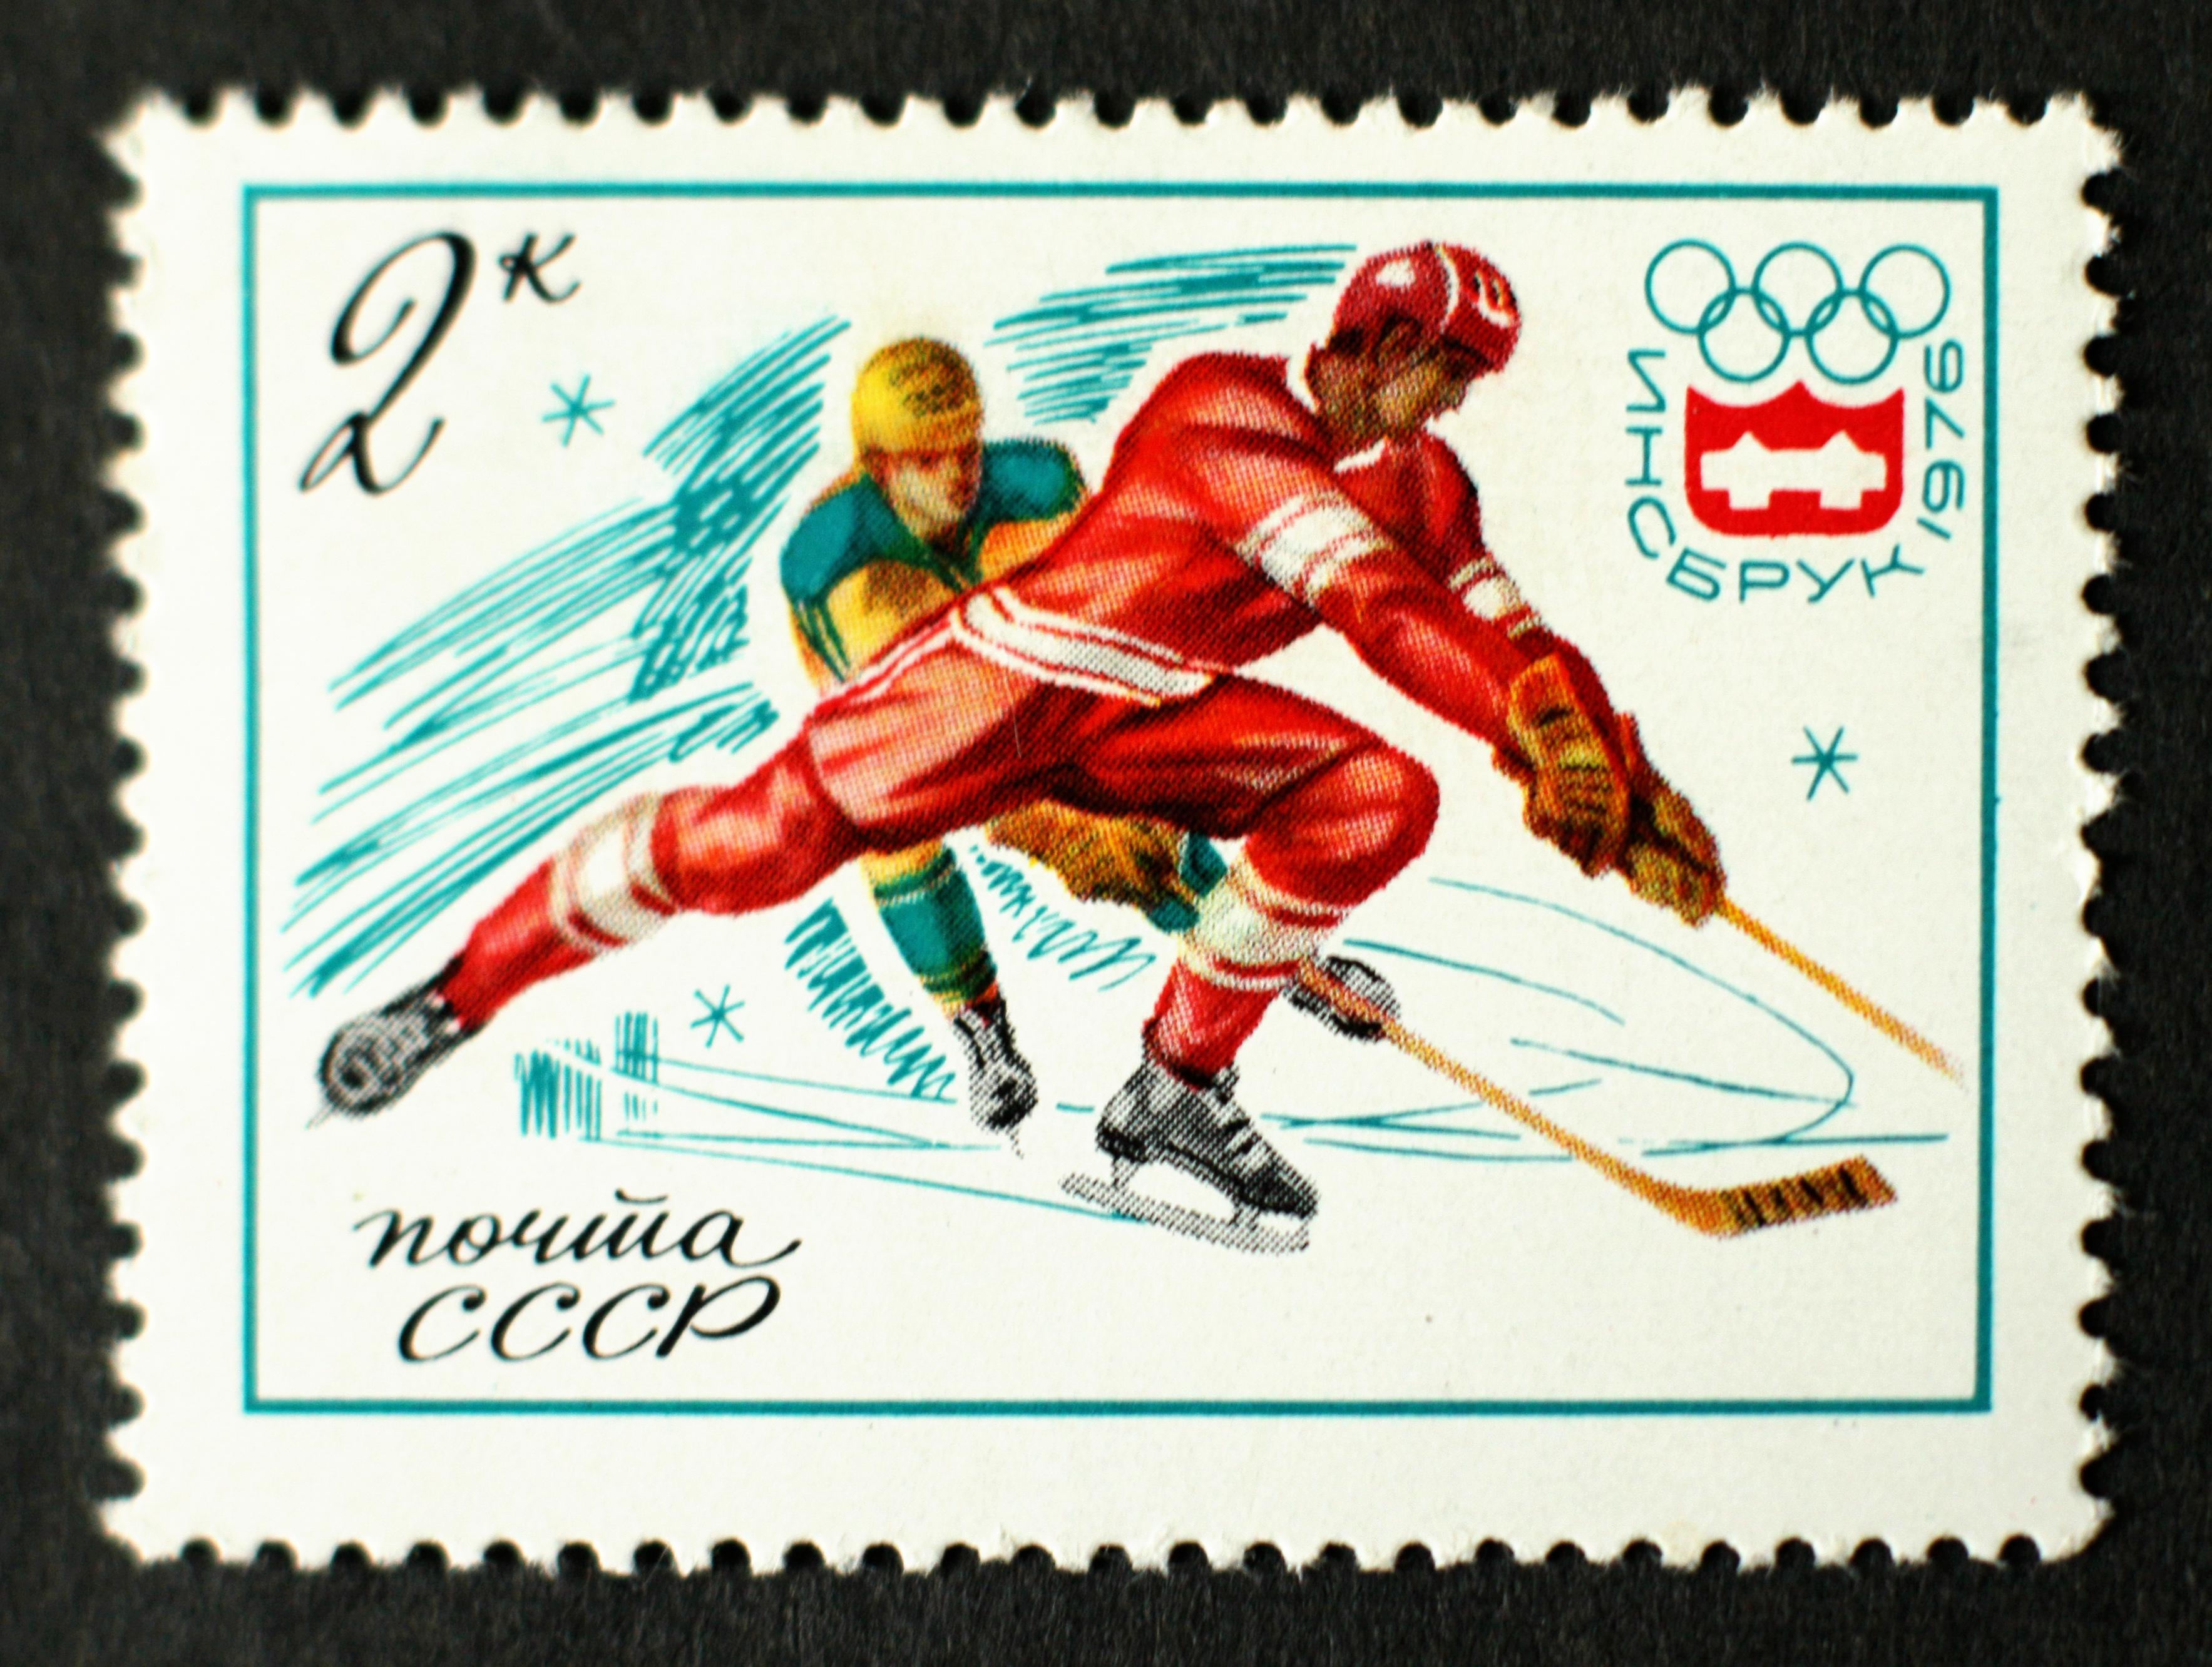 рейтинг медалей олимпиада сочи